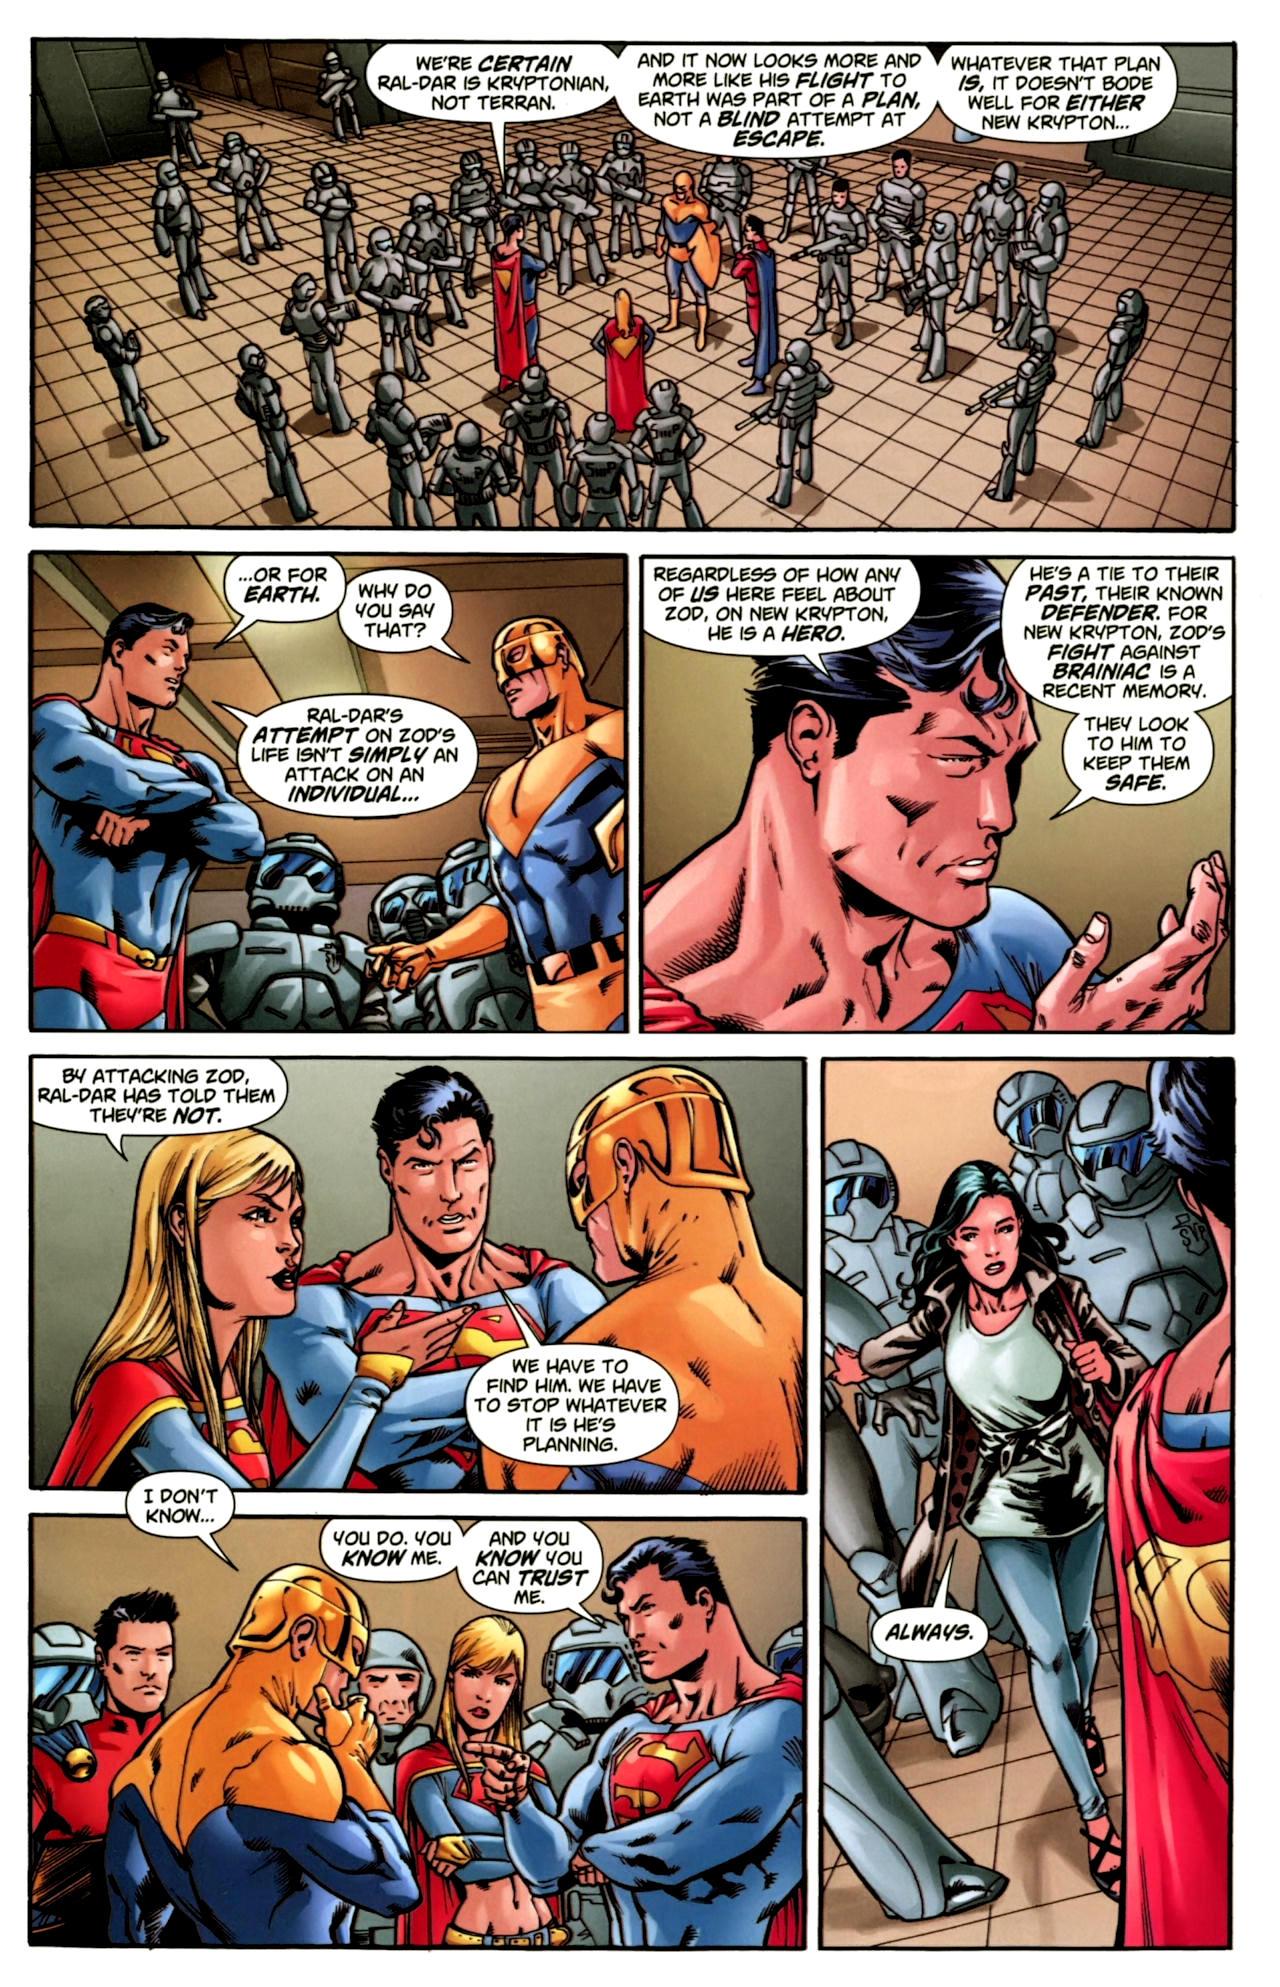 Action Comics (1938) 880 Page 13